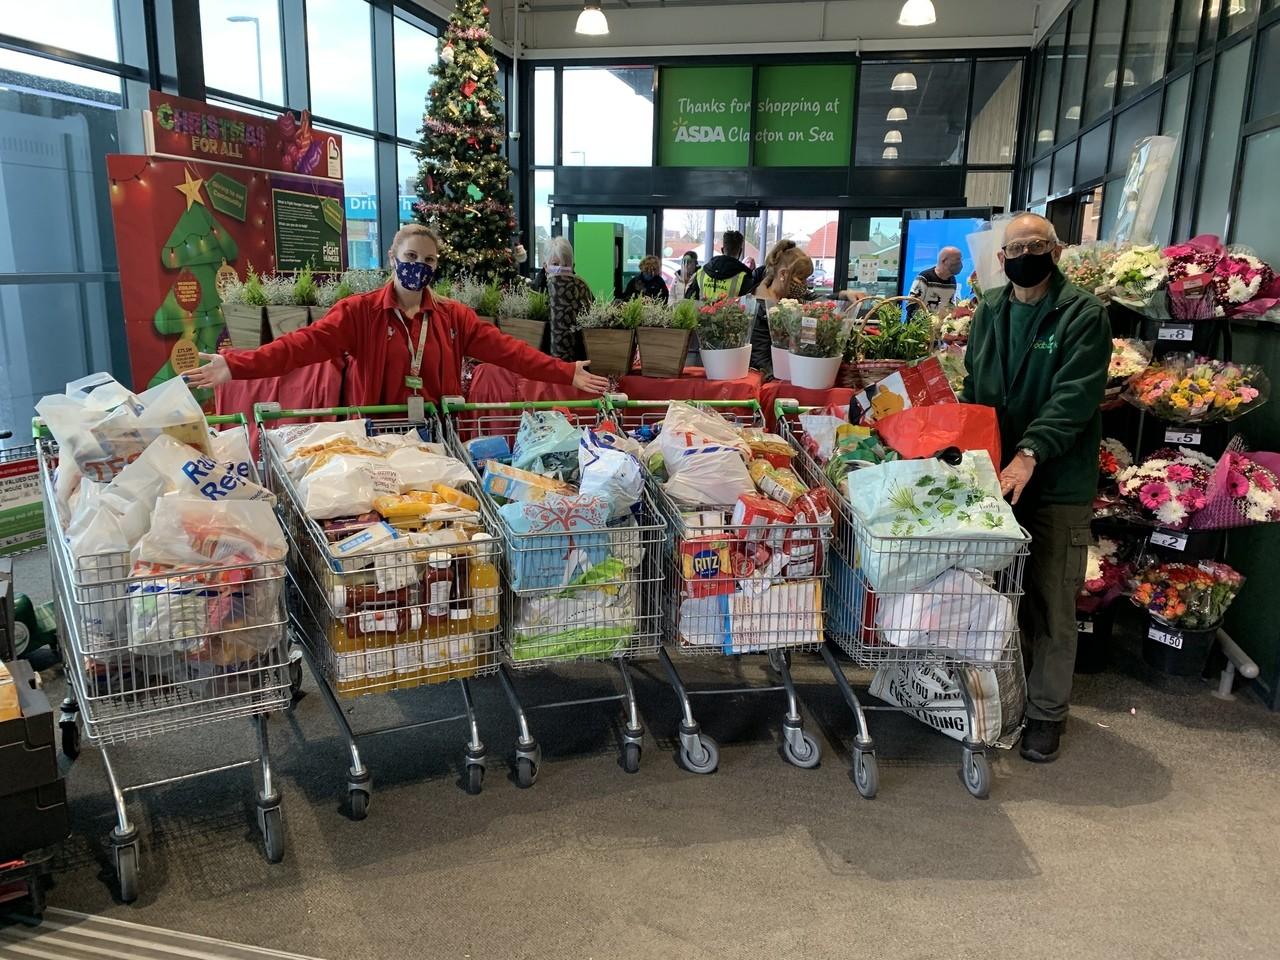 Clacton food bank donations | Asda Clacton-on-Sea